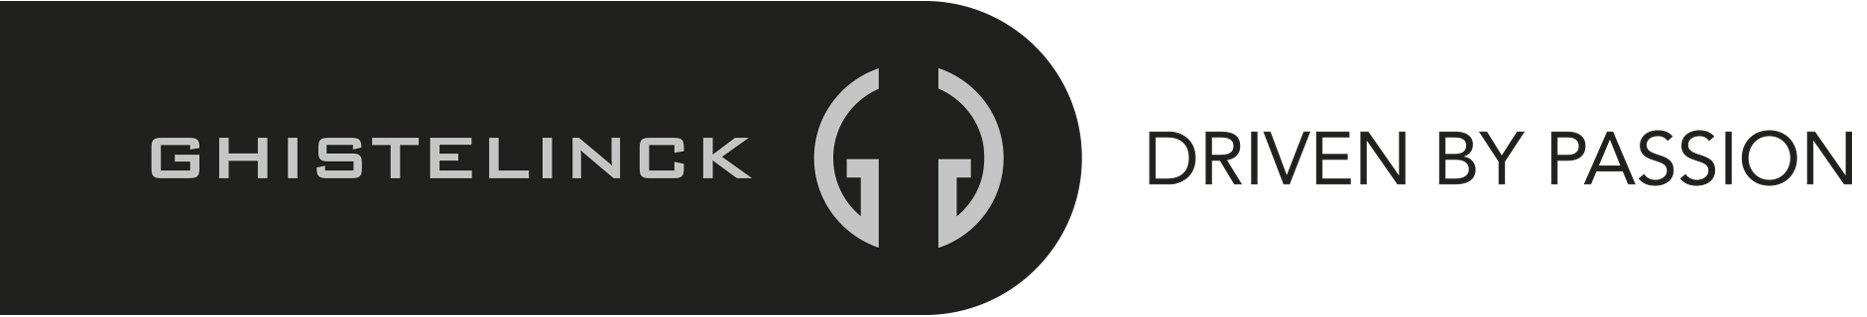 Ghistelinck Autobedrijven NV logo